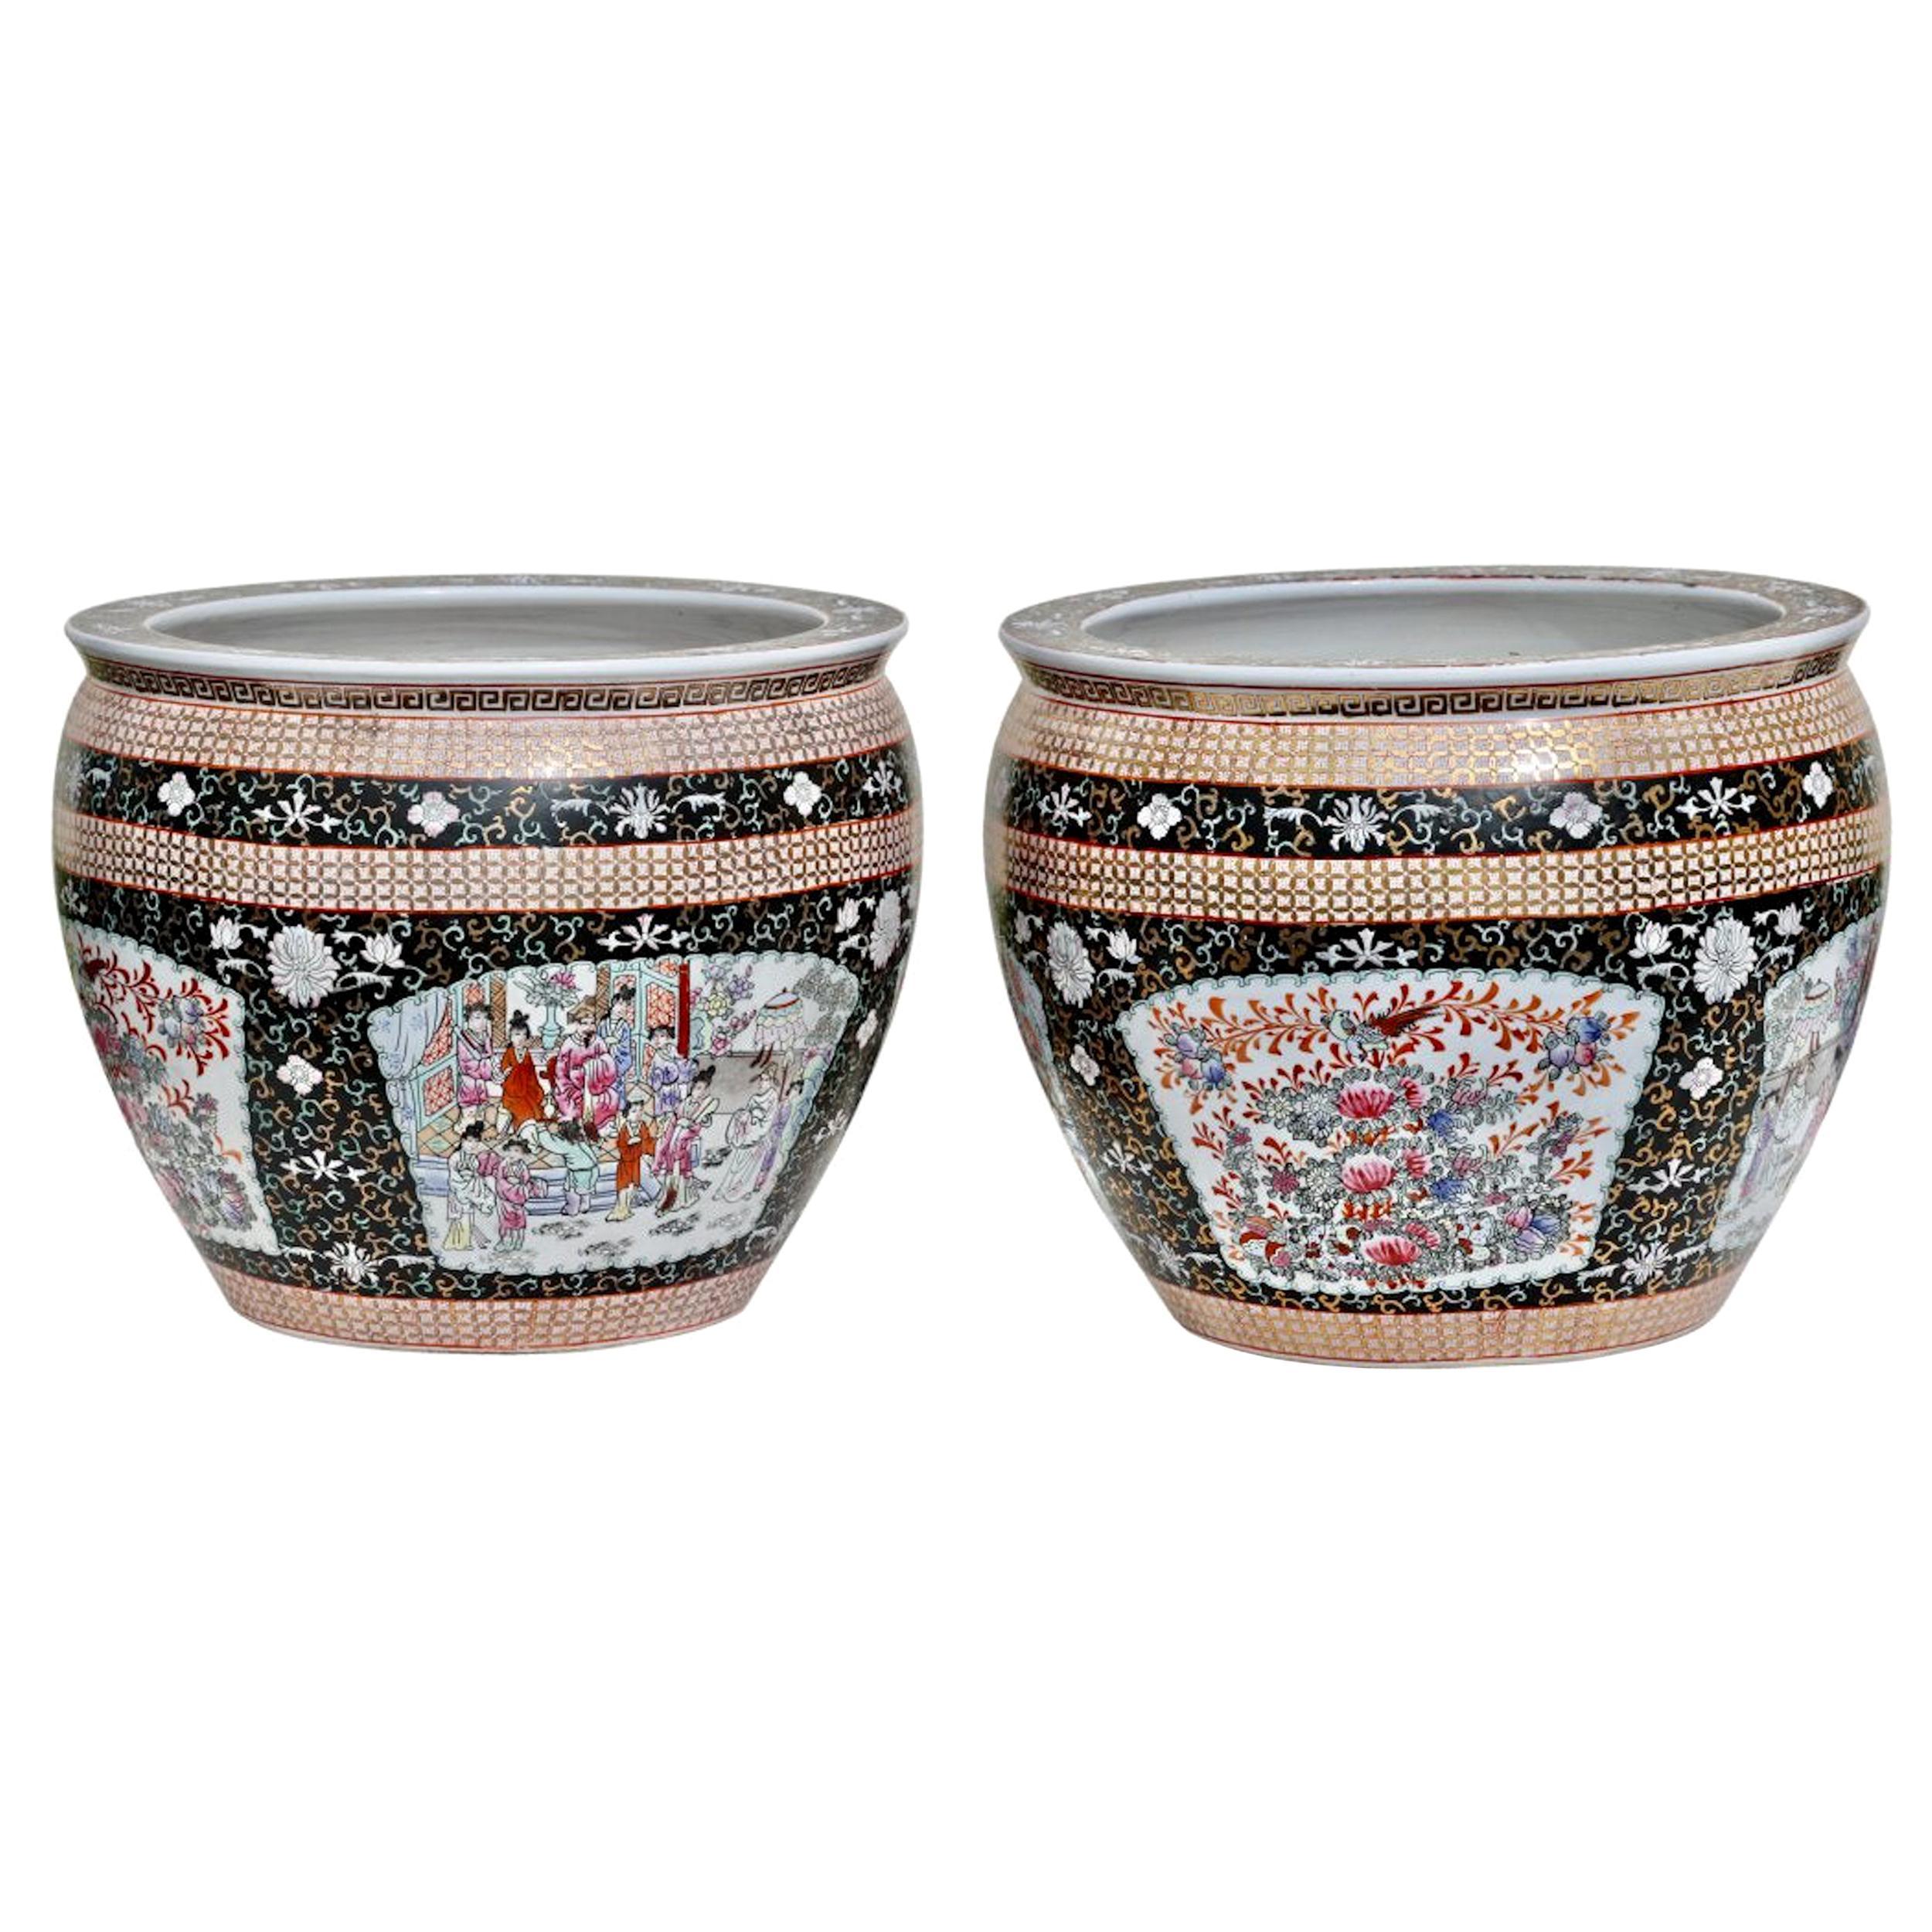 Pair of Porcelain Fish Bowls